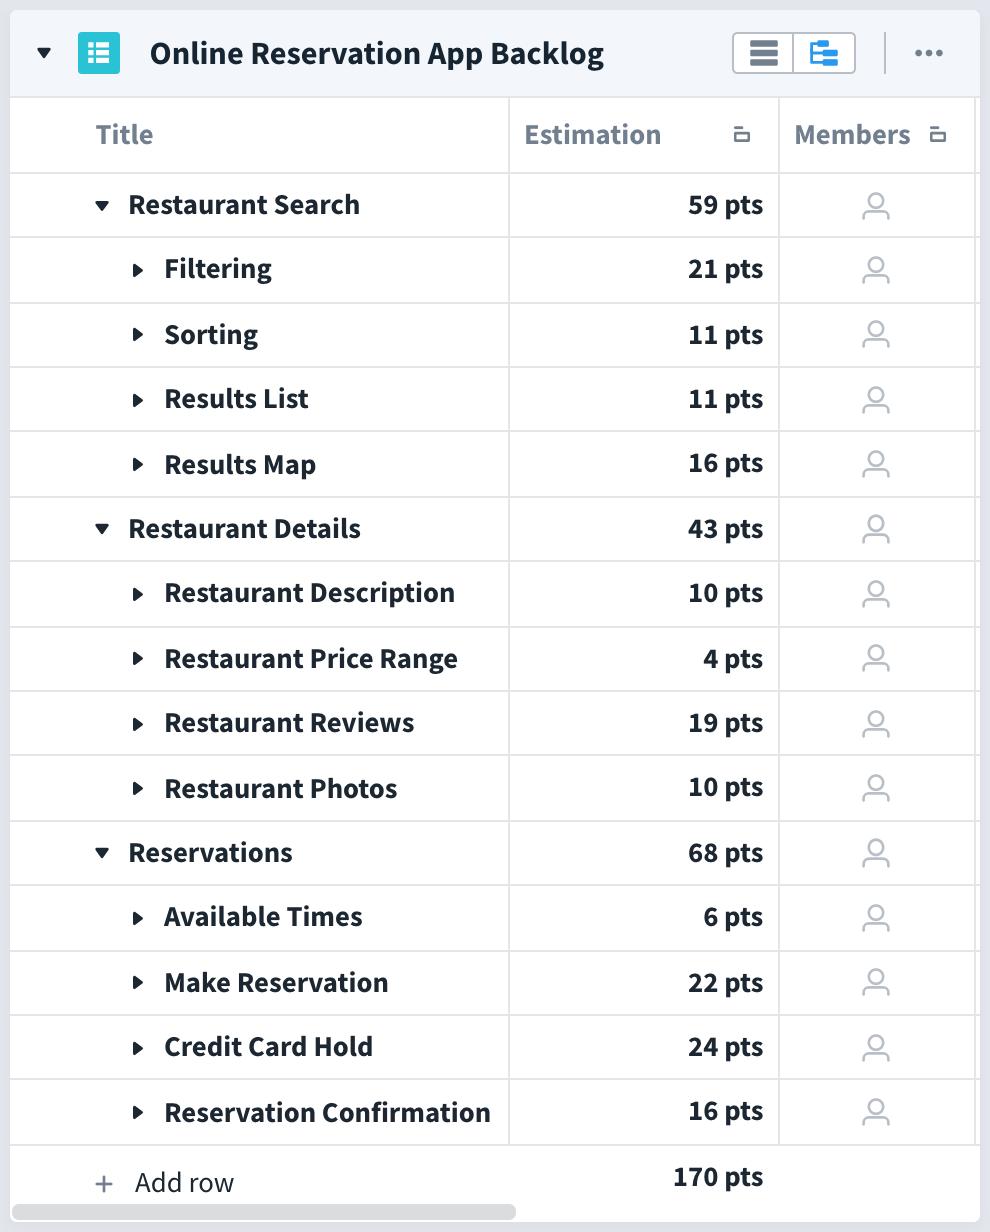 favro backlog example of an online restaurant reservation app